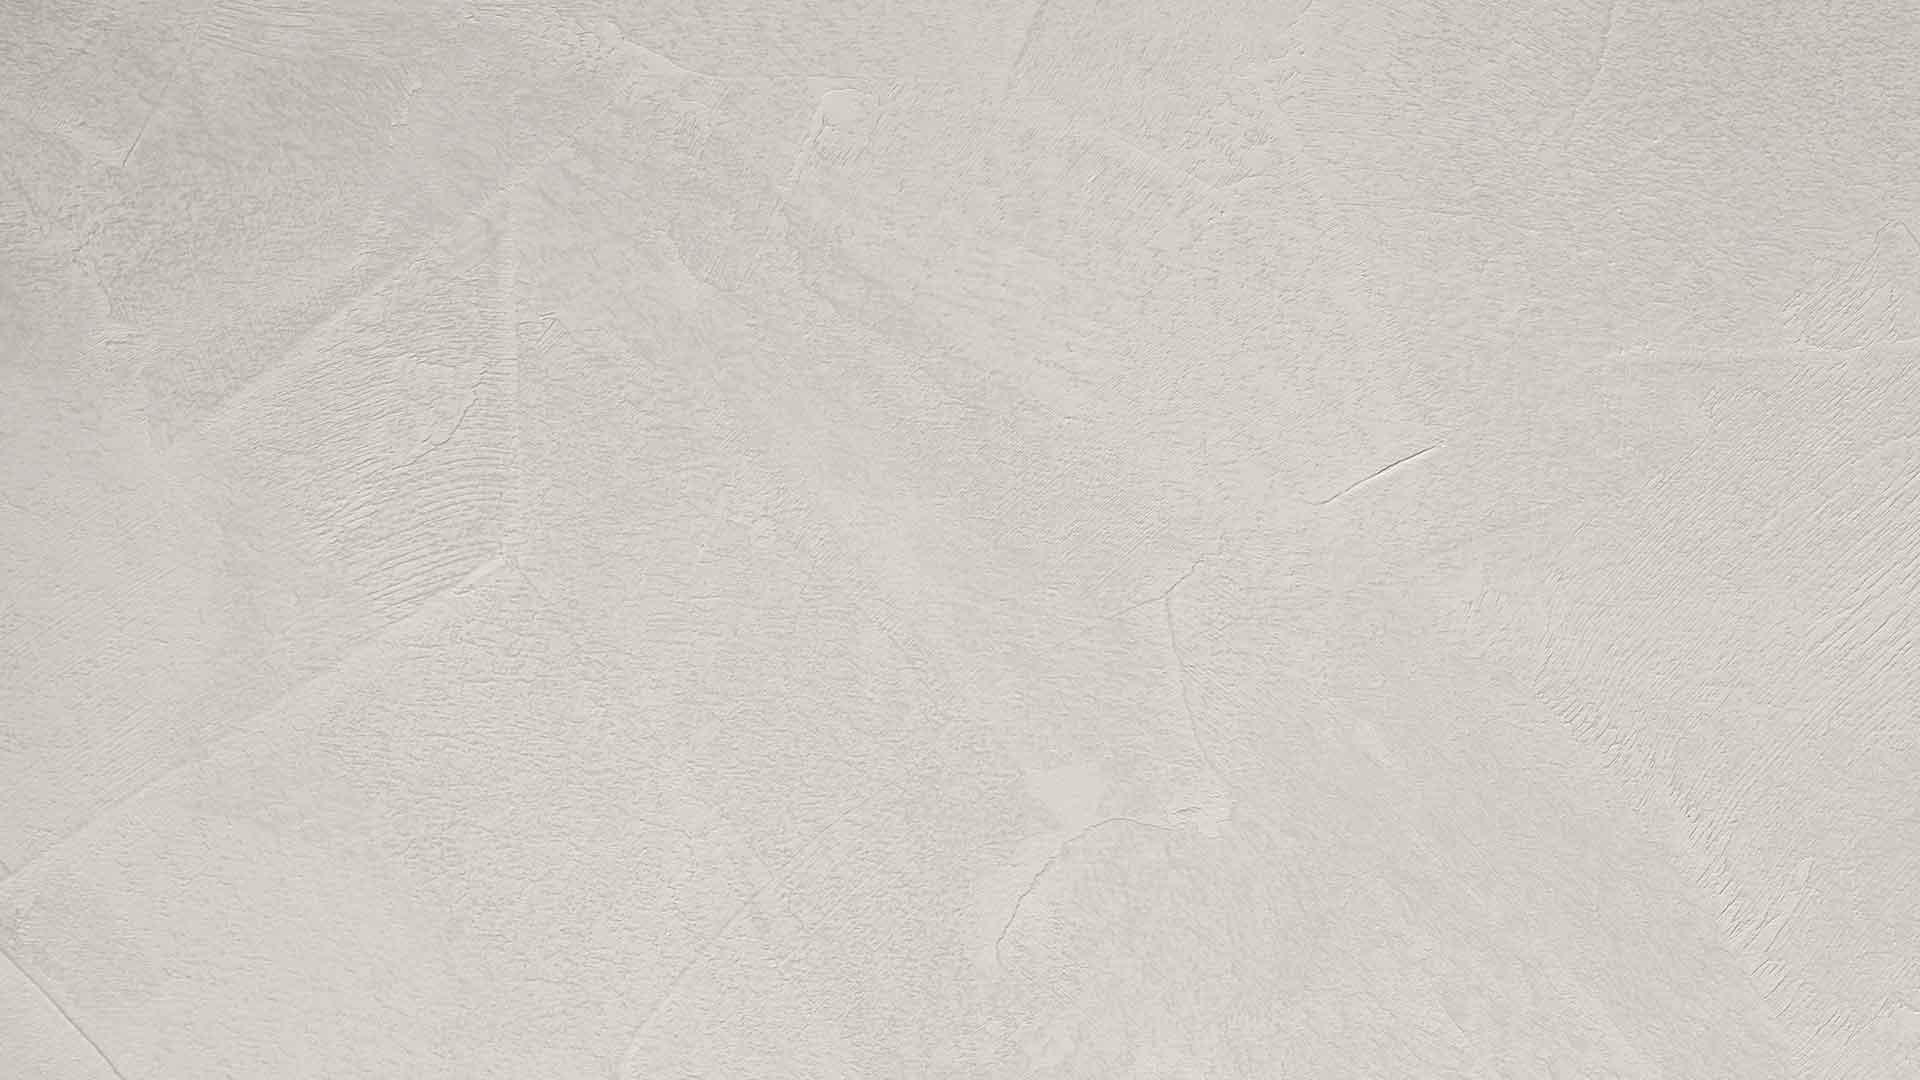 Full Size of Alpina Betonoptik Set Obi Auf Raufaser Farbe Bauhaus Video Farbrezepte Effektfarbe Beton Optik Komplett Hellgrau Toom Beton Optik Grau Feine Farben Küche Wohnzimmer Alpina Betonoptik